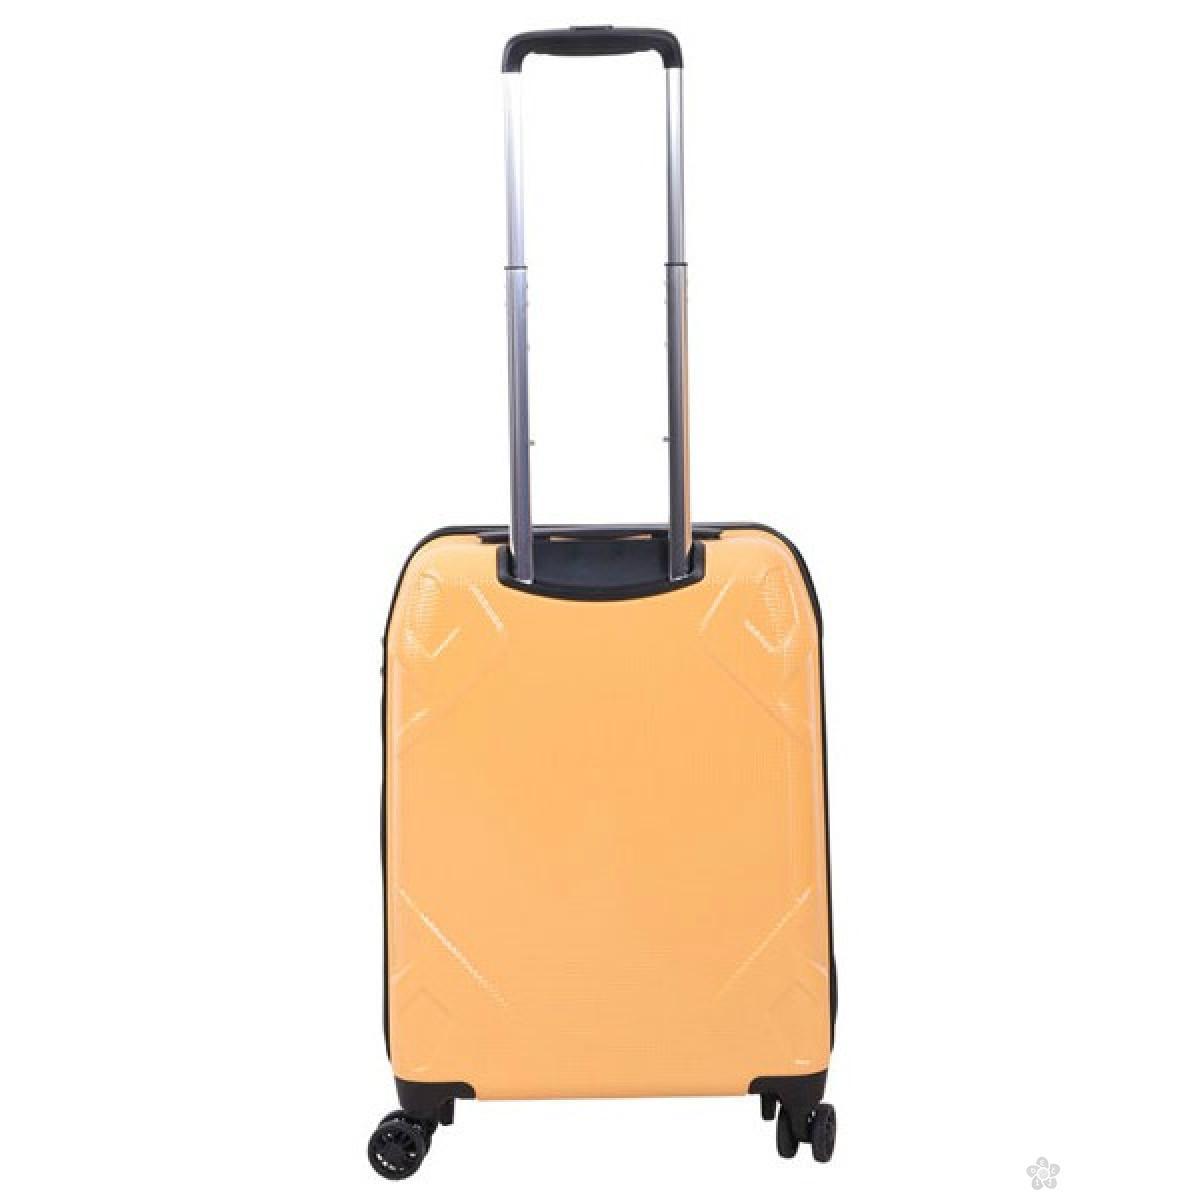 Kofer Pulse Soho žuti 20inch X21160